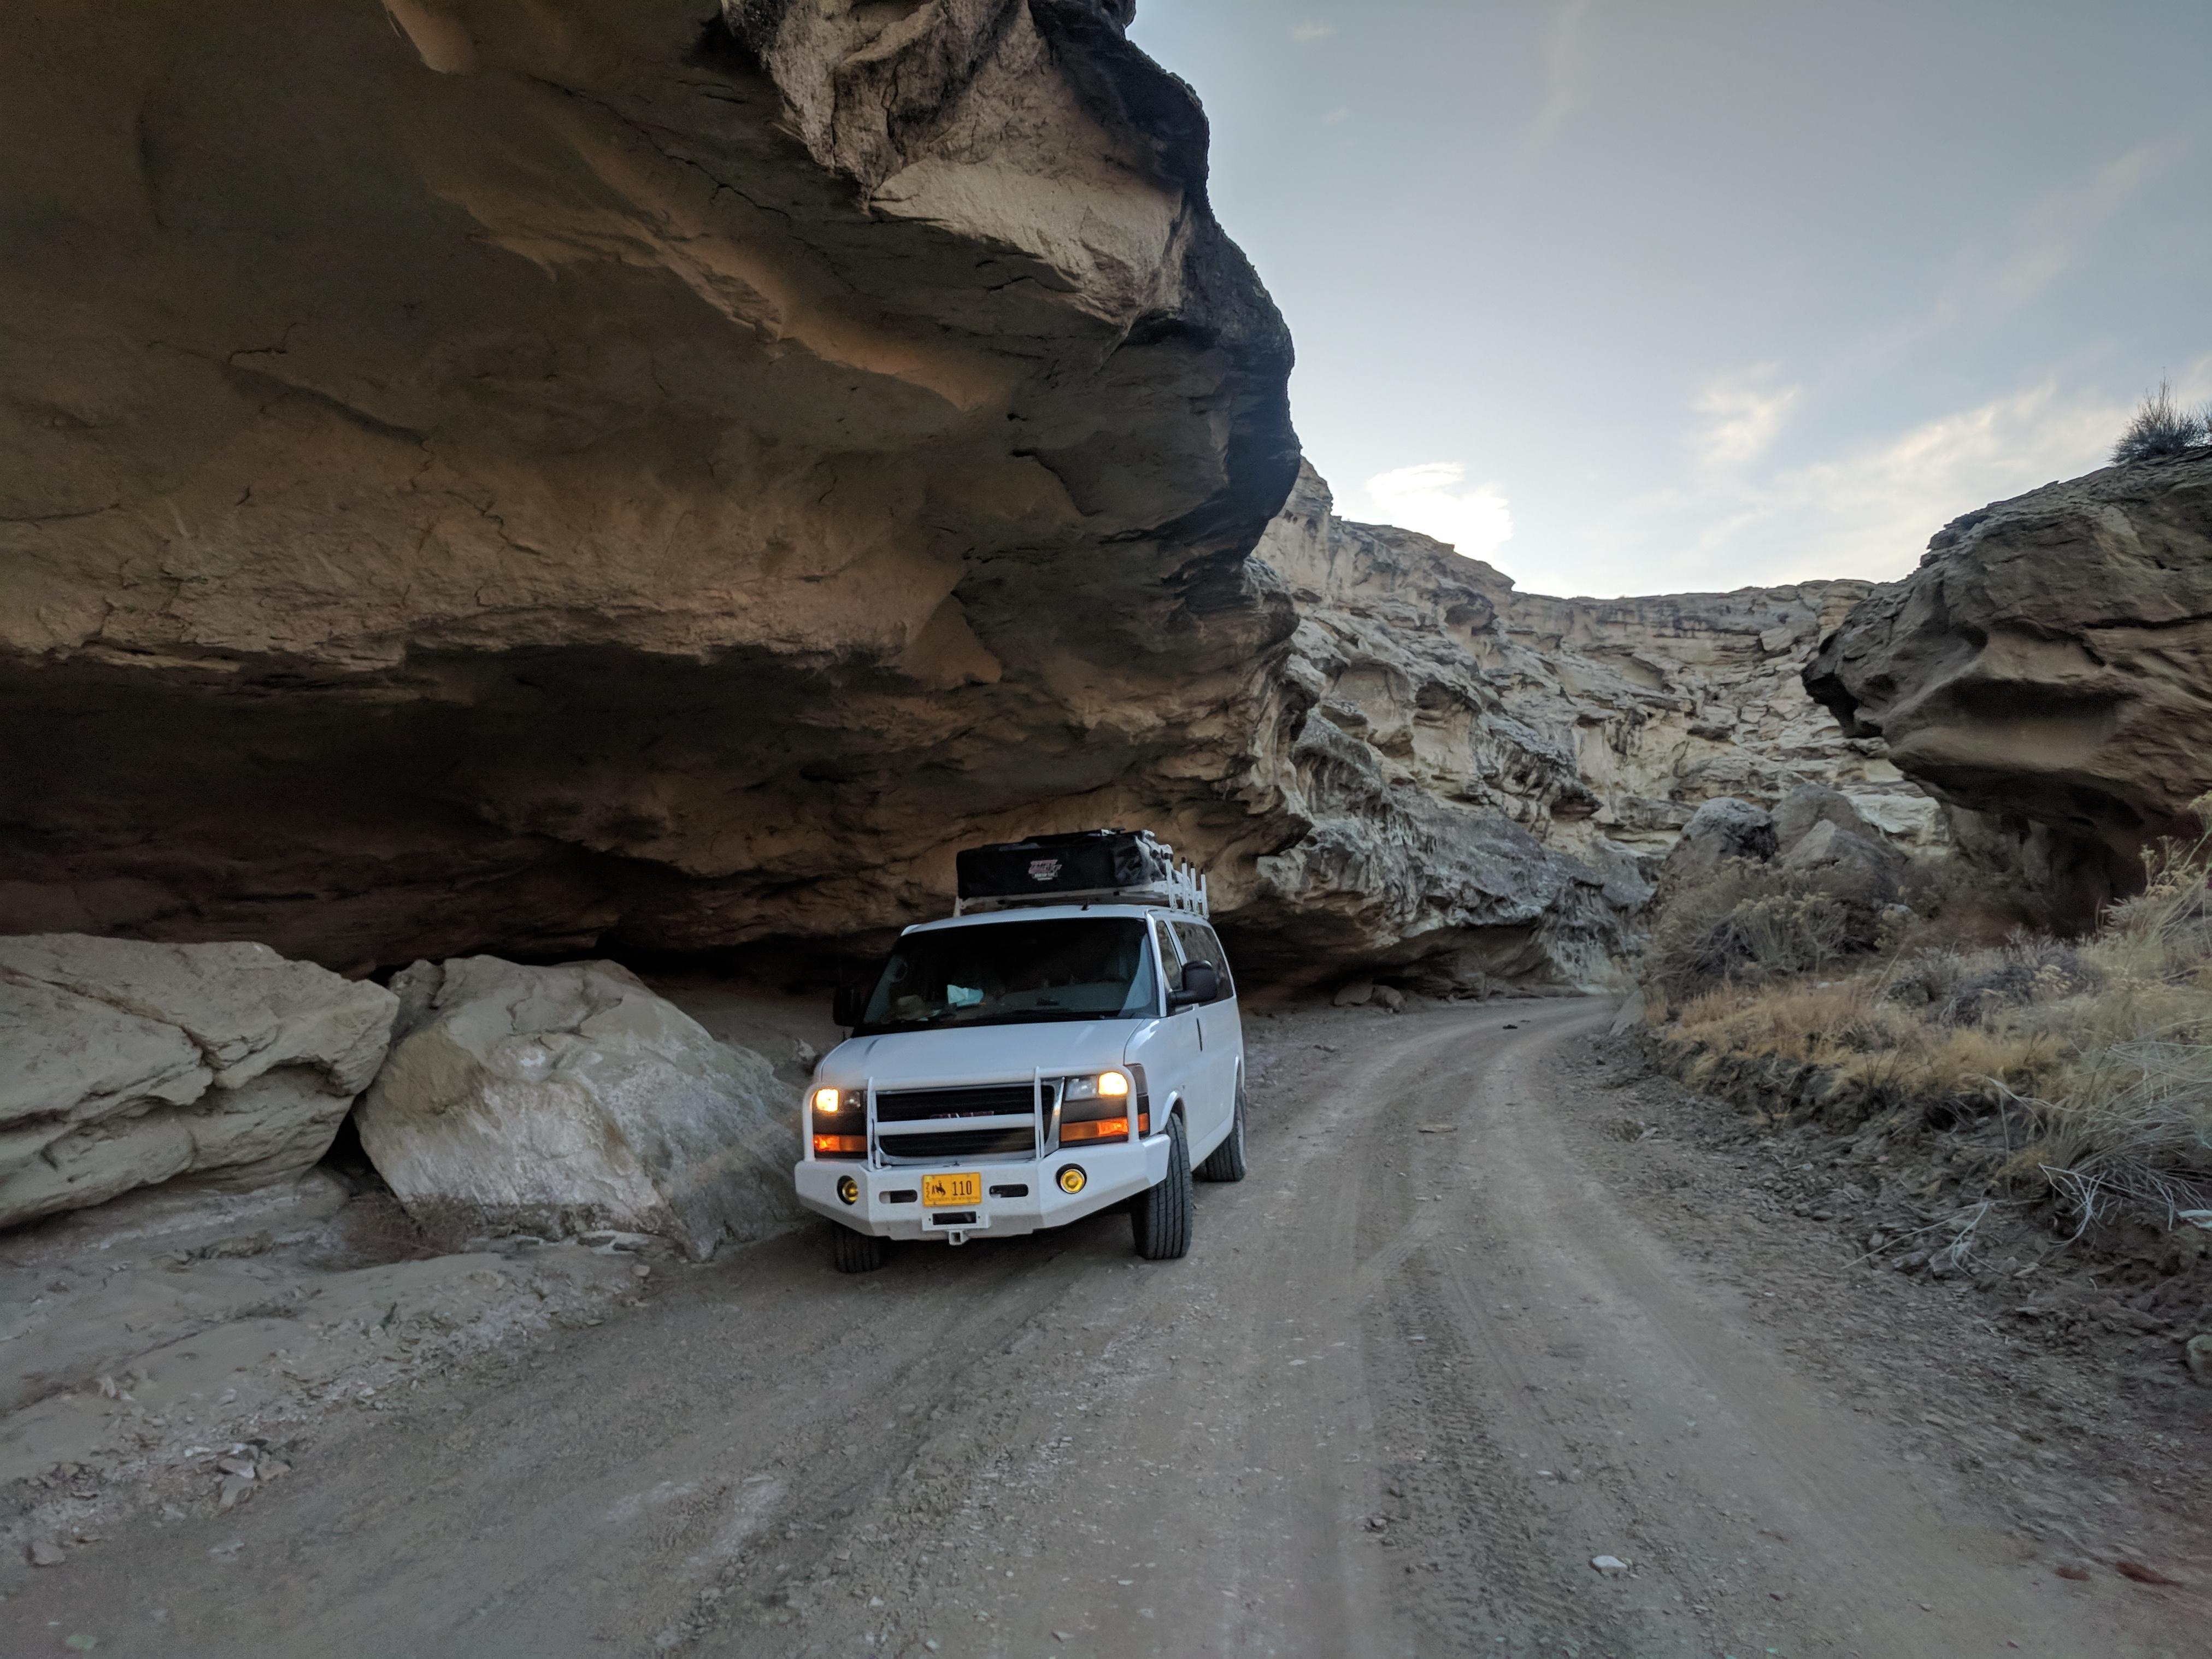 Crosby Canyon